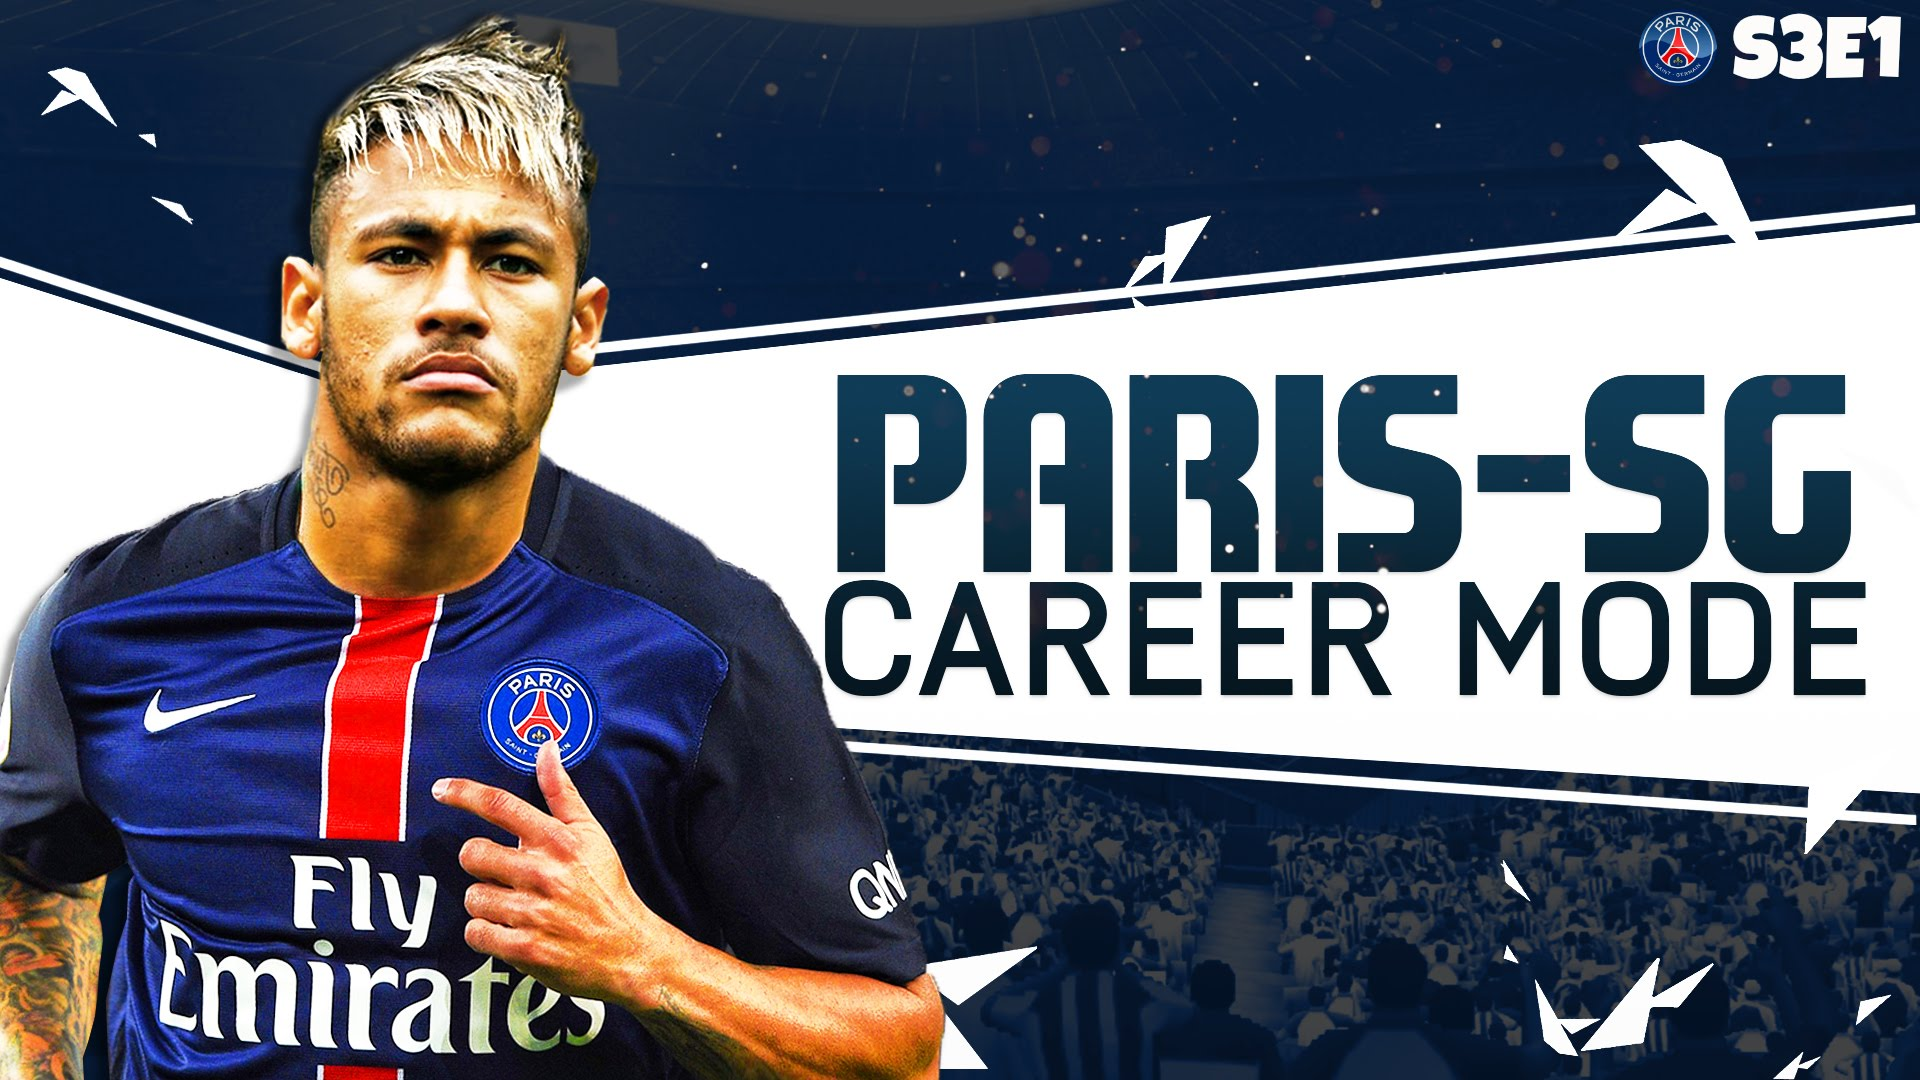 Neymar Wallpaper PSG 2018   Live Wallpaper HD 1920x1080